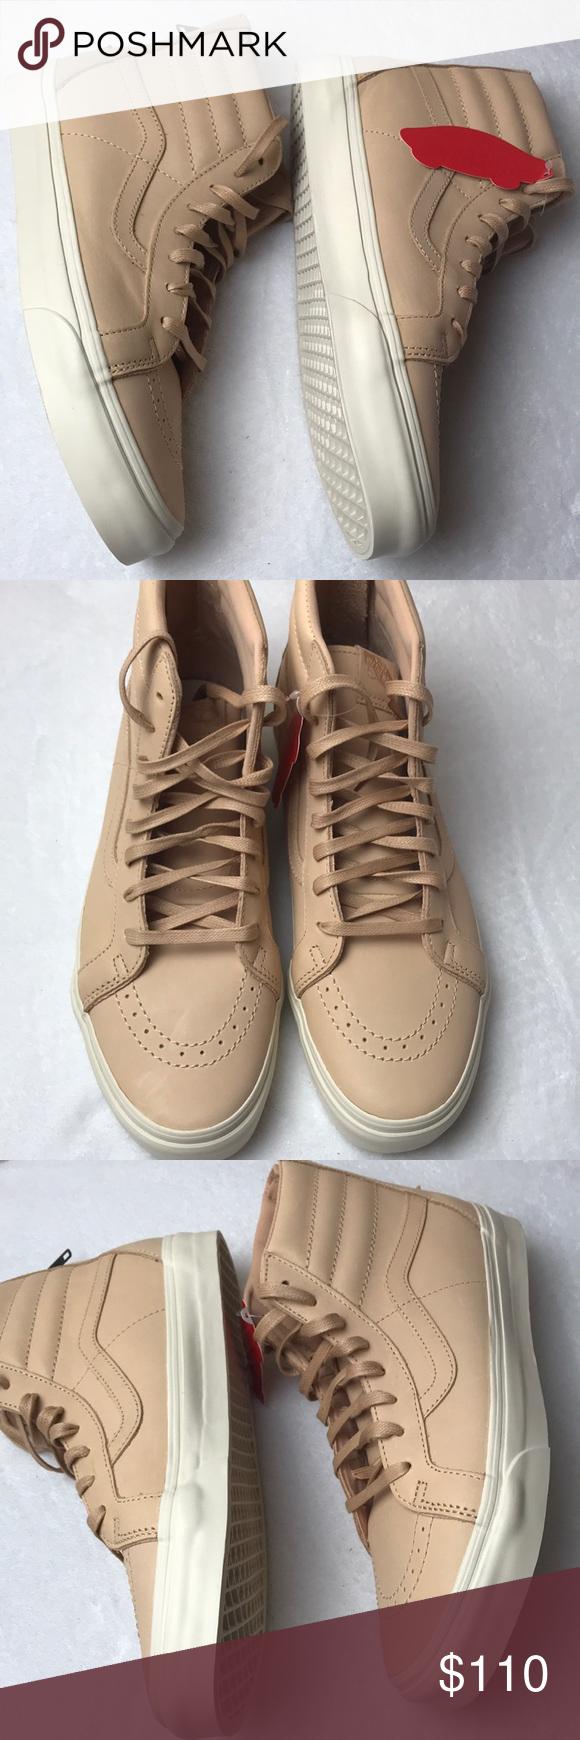 9ab073ee0b0e6b Vans SK8-Hi Reissue Zip Veggie Tan Leather mens Vans SK8-Hi Reissue Zip  Veggie Tan Leather mens shoes size 11. Brand new in box. Top of box  slightly creased ...